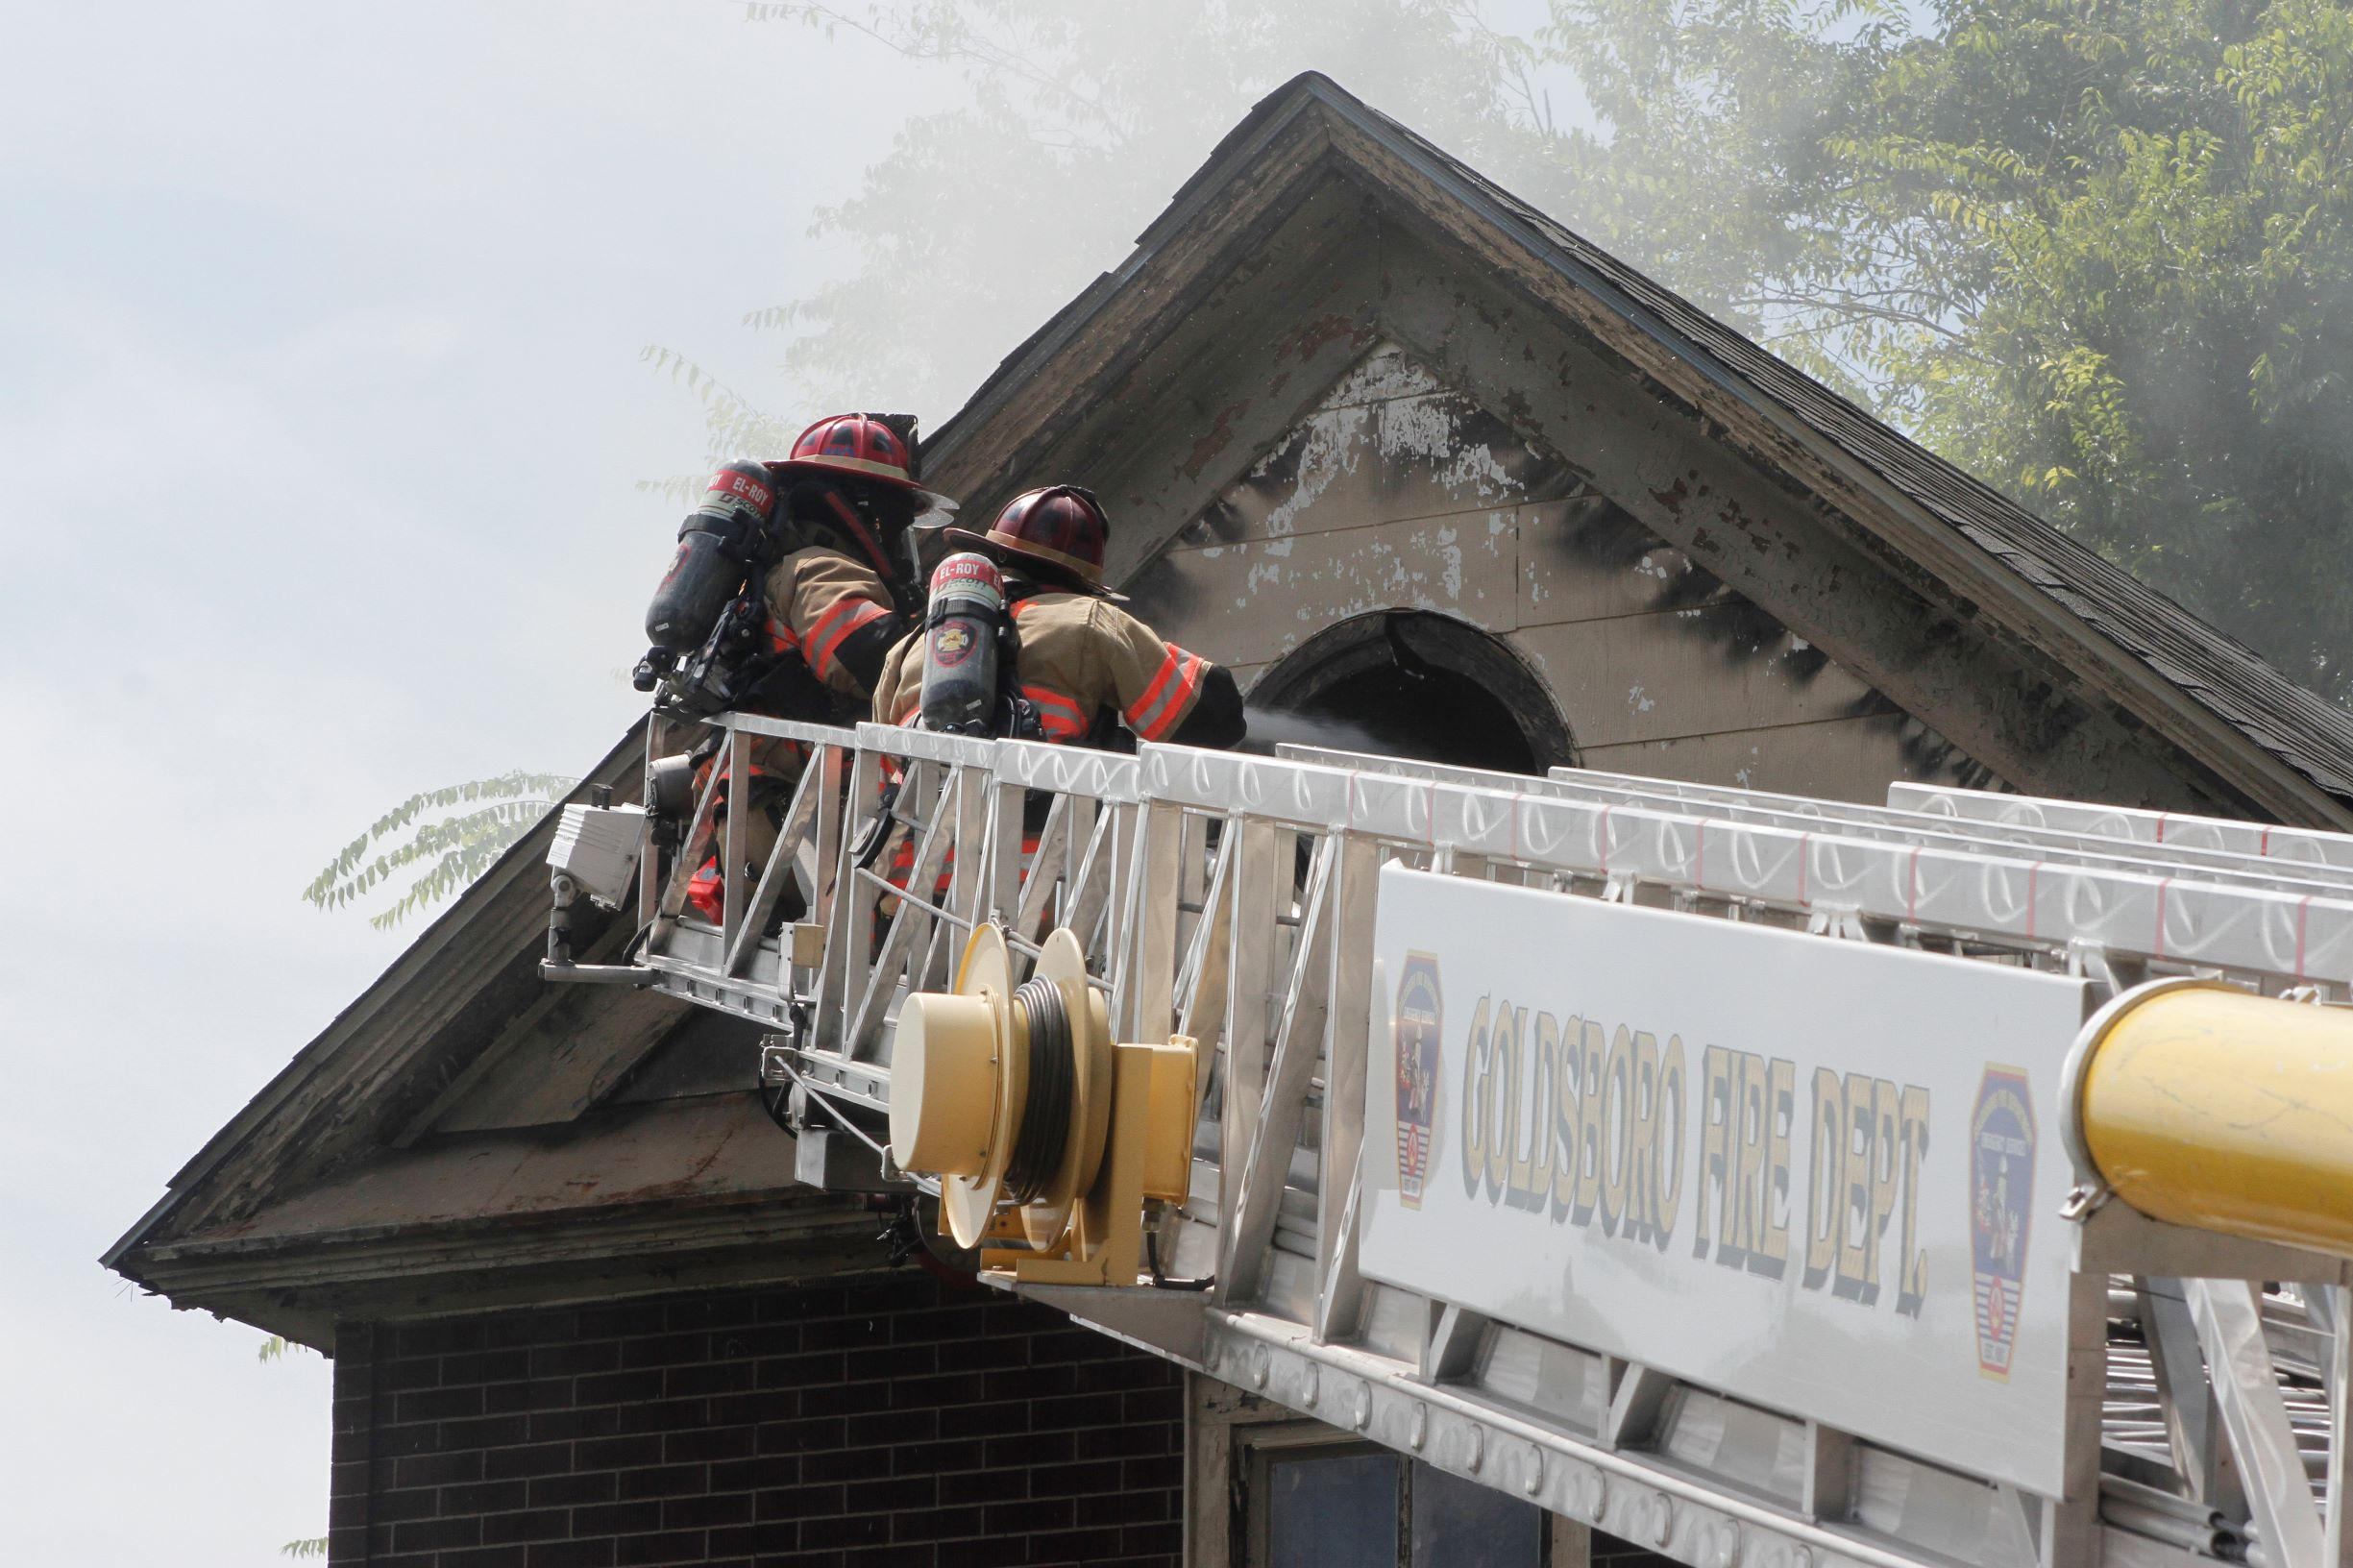 Excessive Heat Hampers Firefighters At Vine St. Blaze